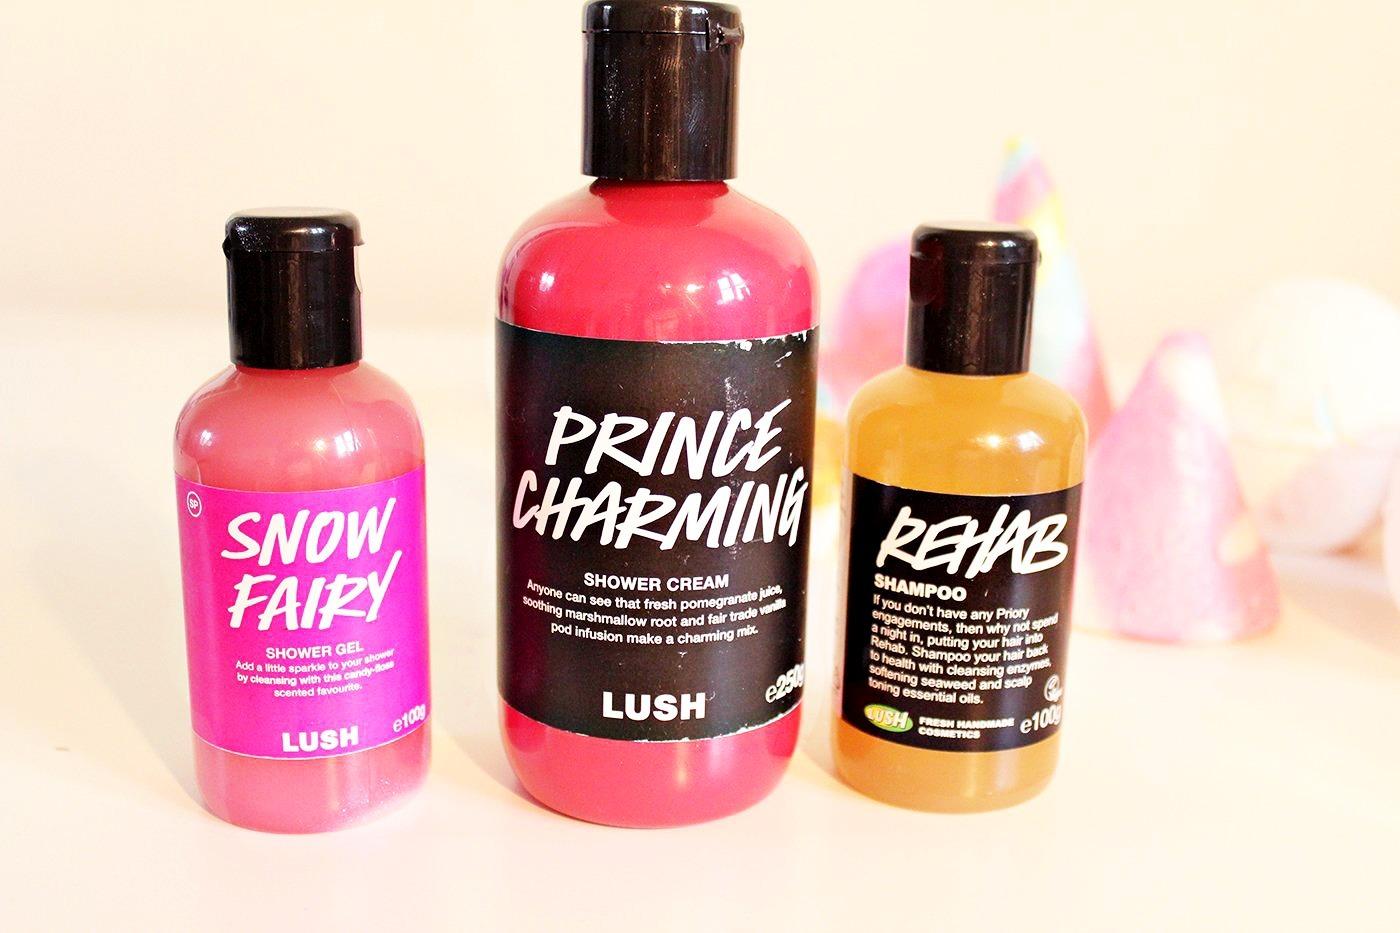 lush shower gels